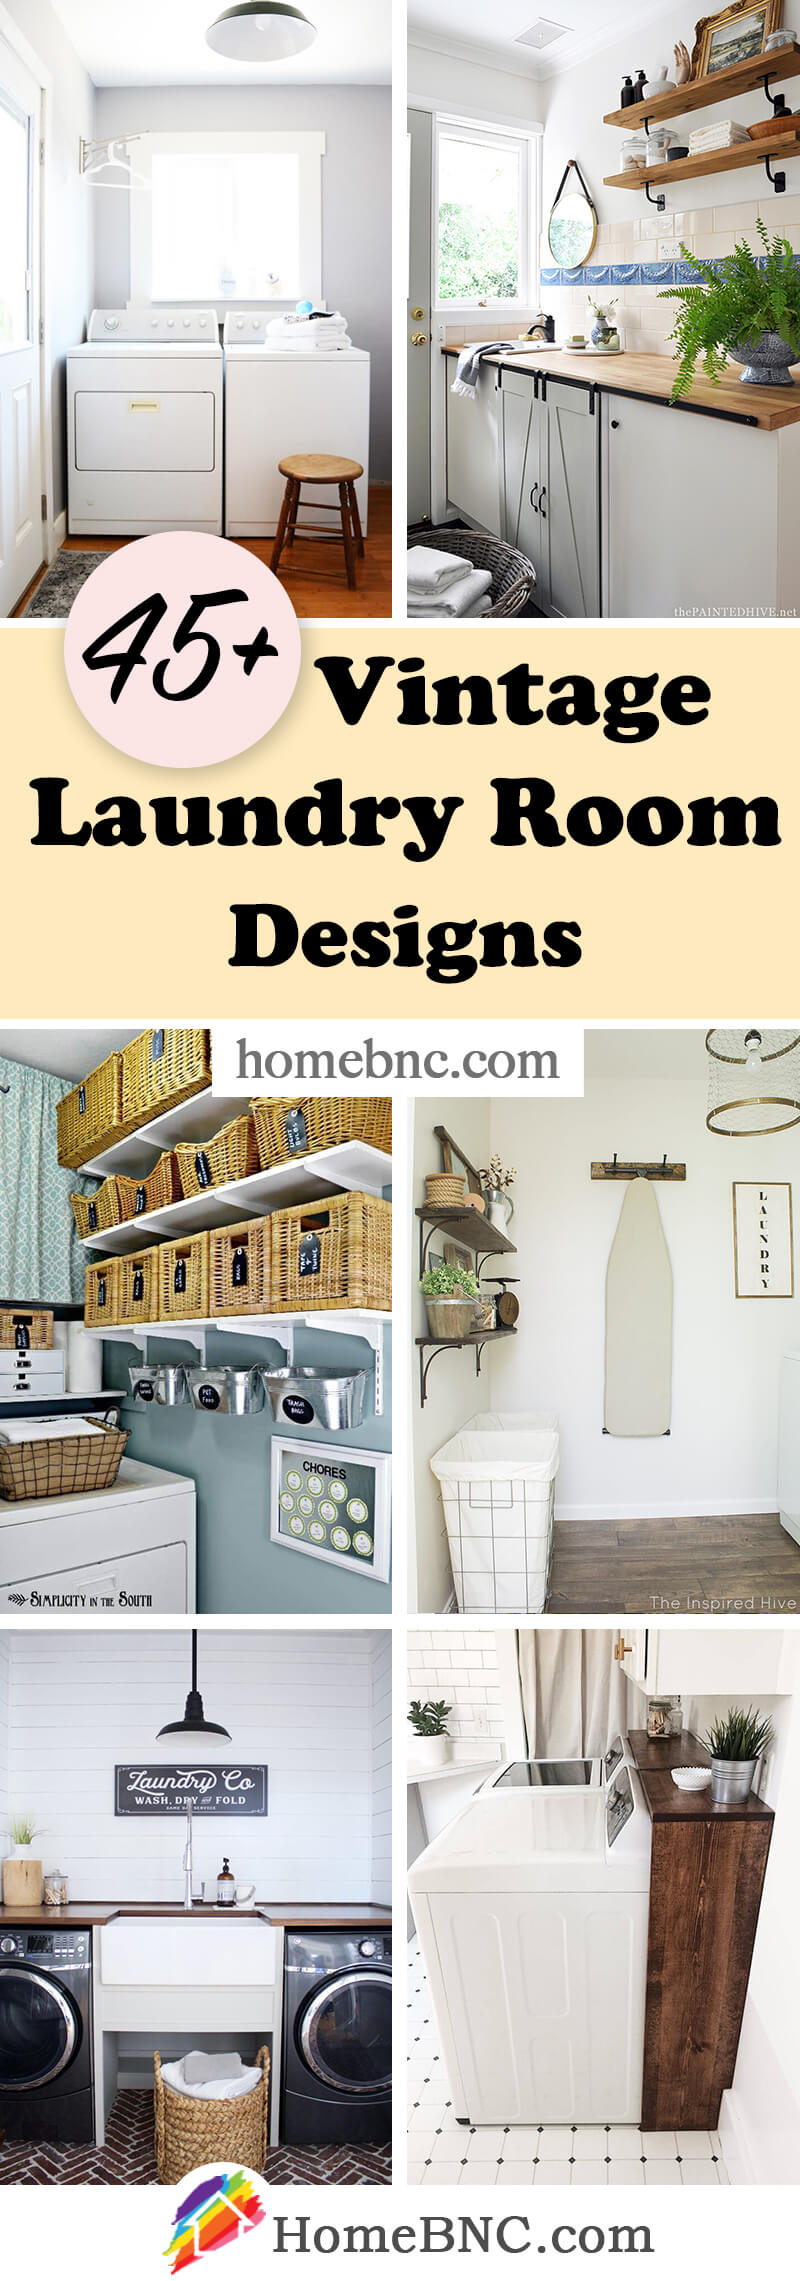 Vintage Laundry Room Designs